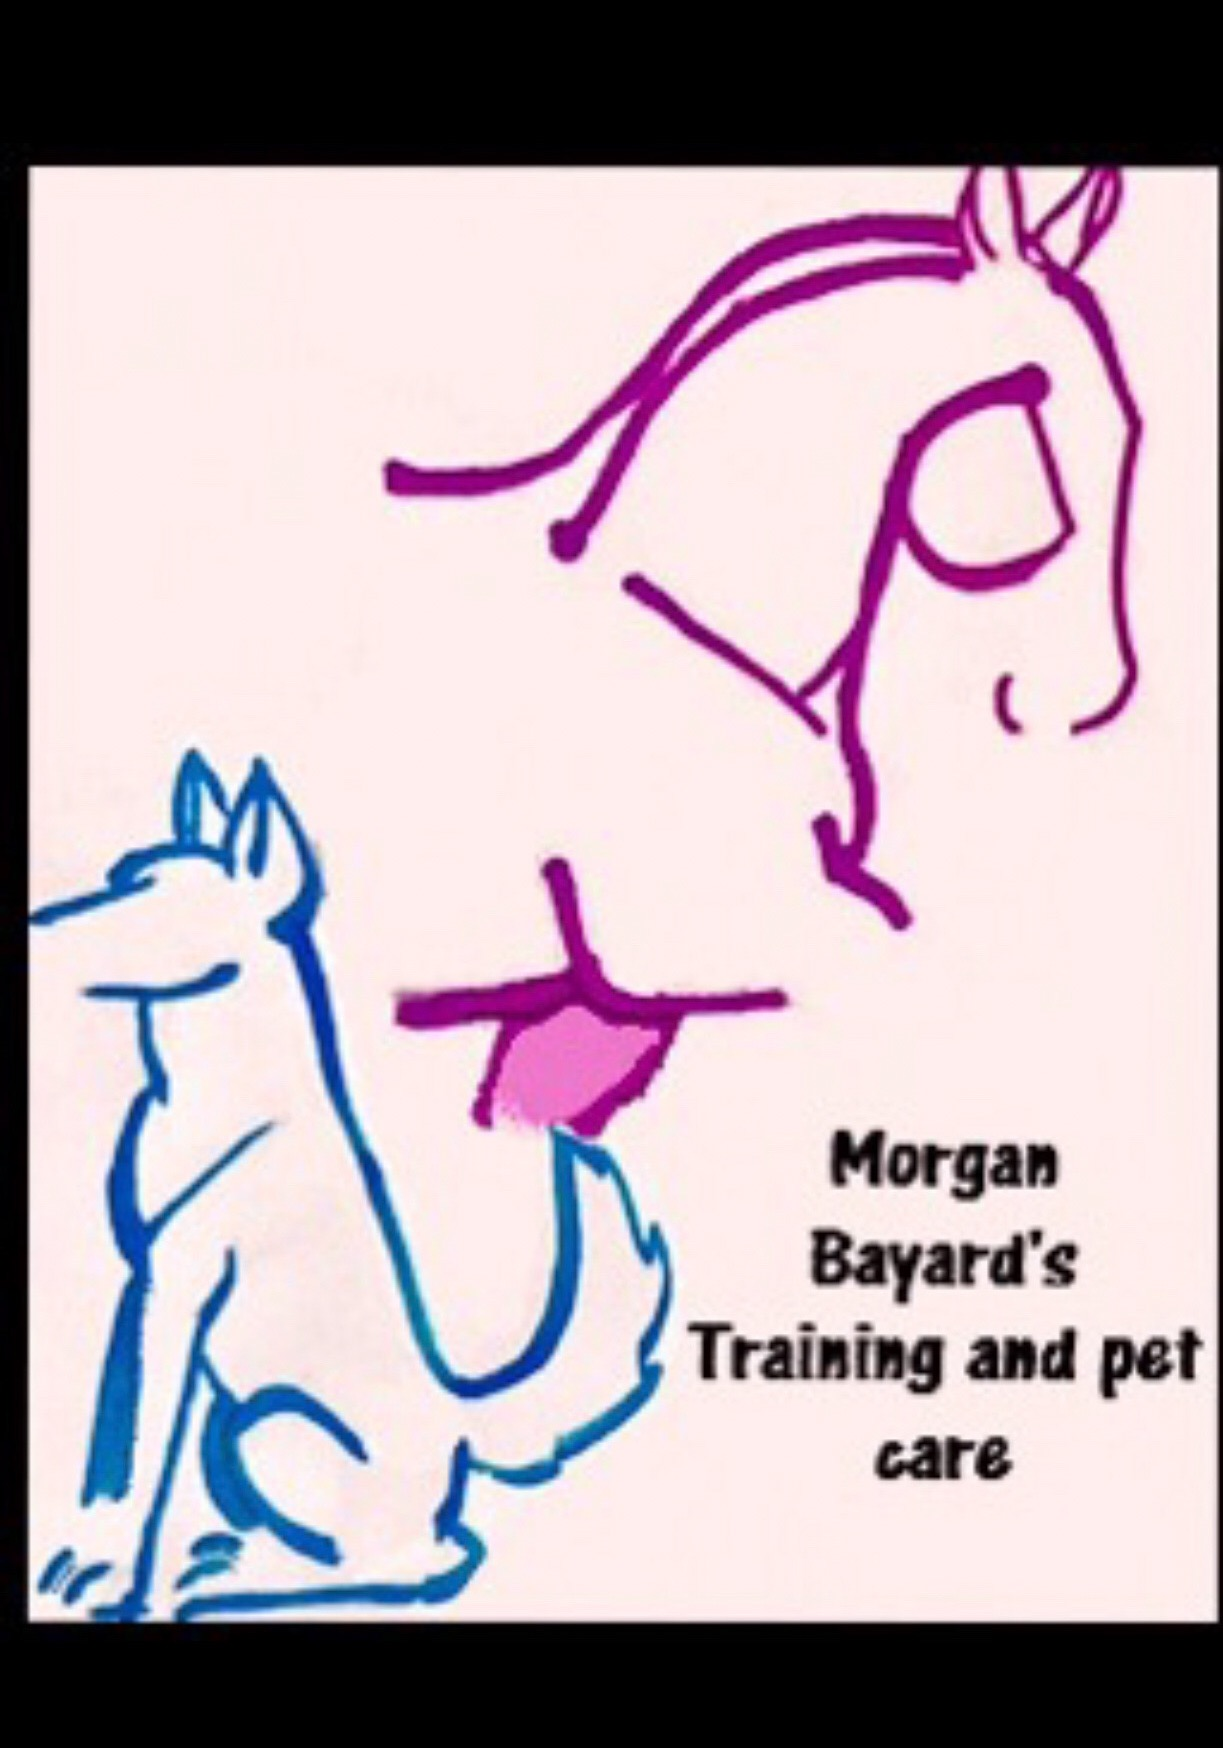 Morgan Bayard's Training and Pet Care